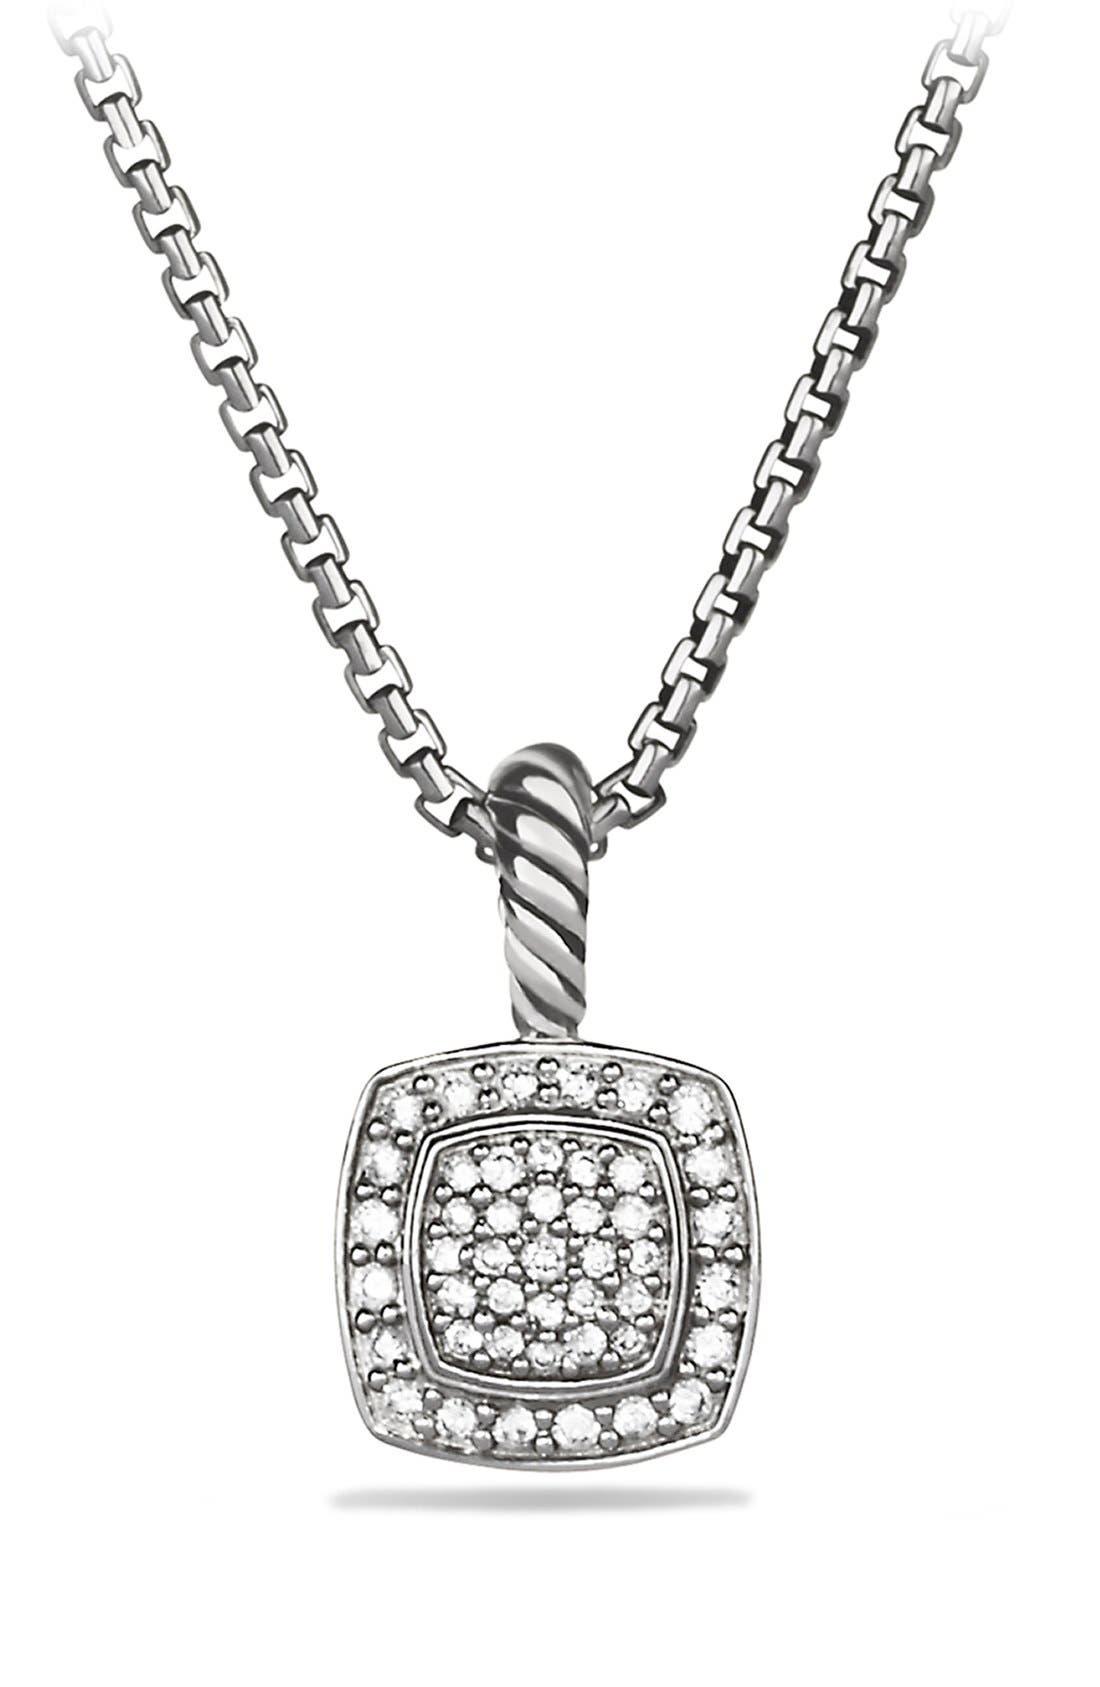 Main Image - David Yurman 'Albion' Petite Pendant with Diamonds on Chain